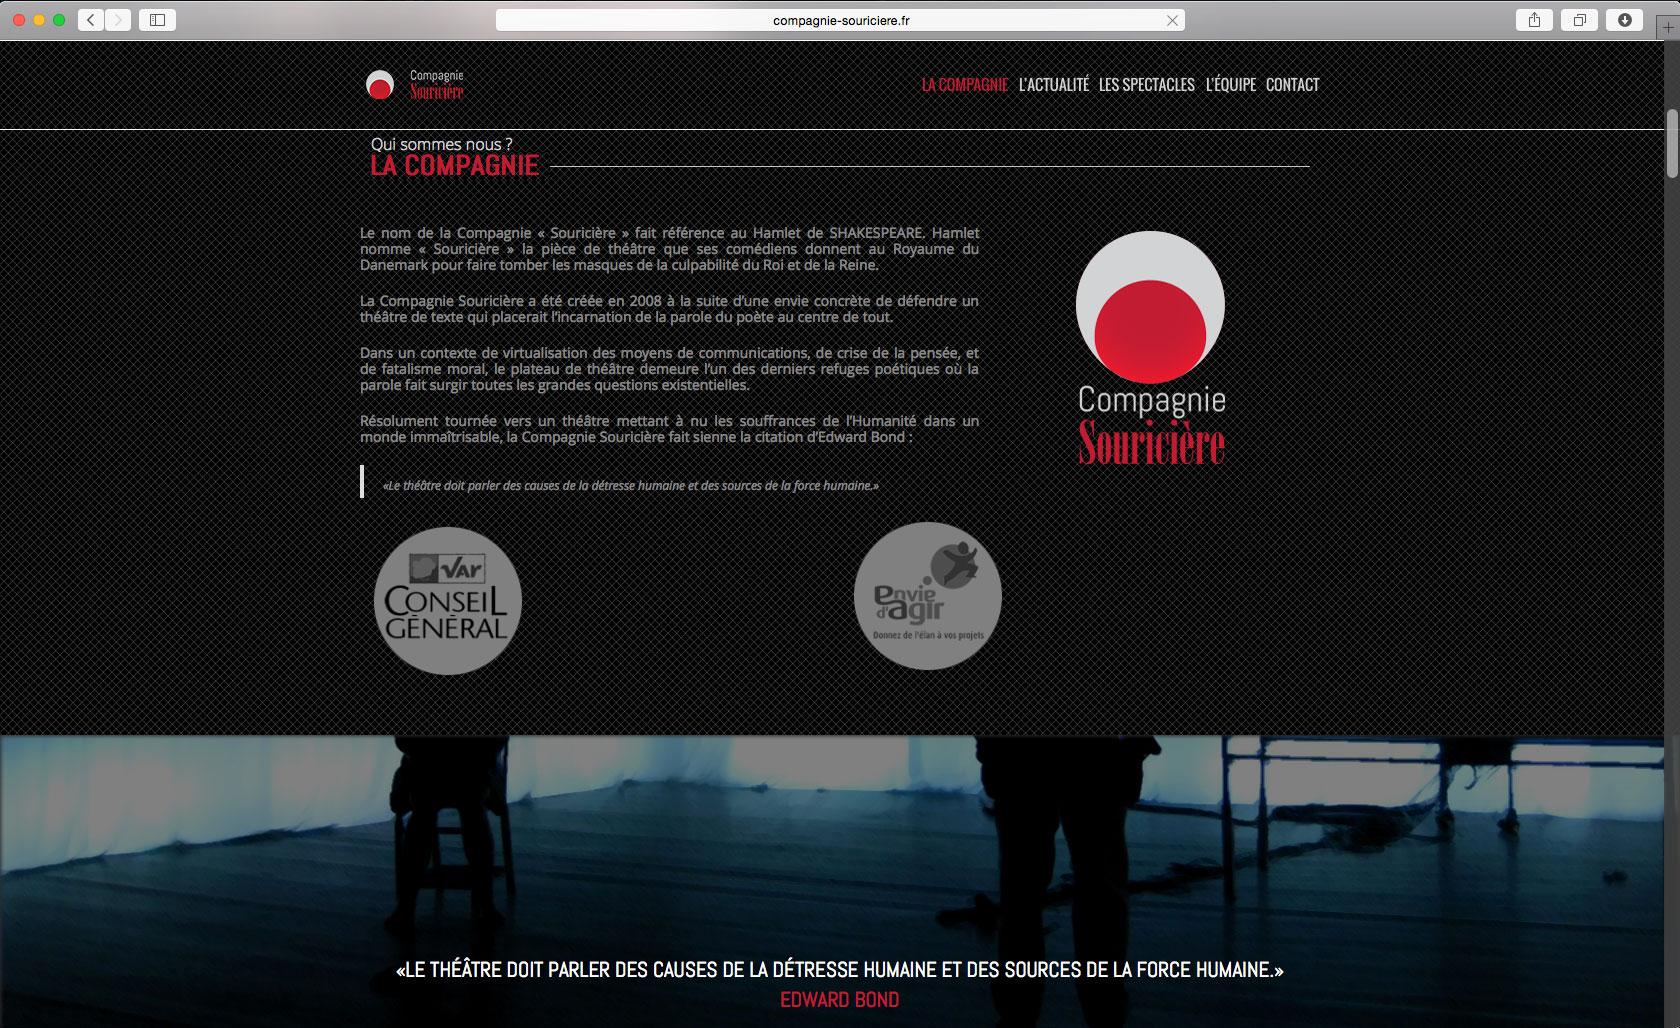 site internet de la compagnie souriciere